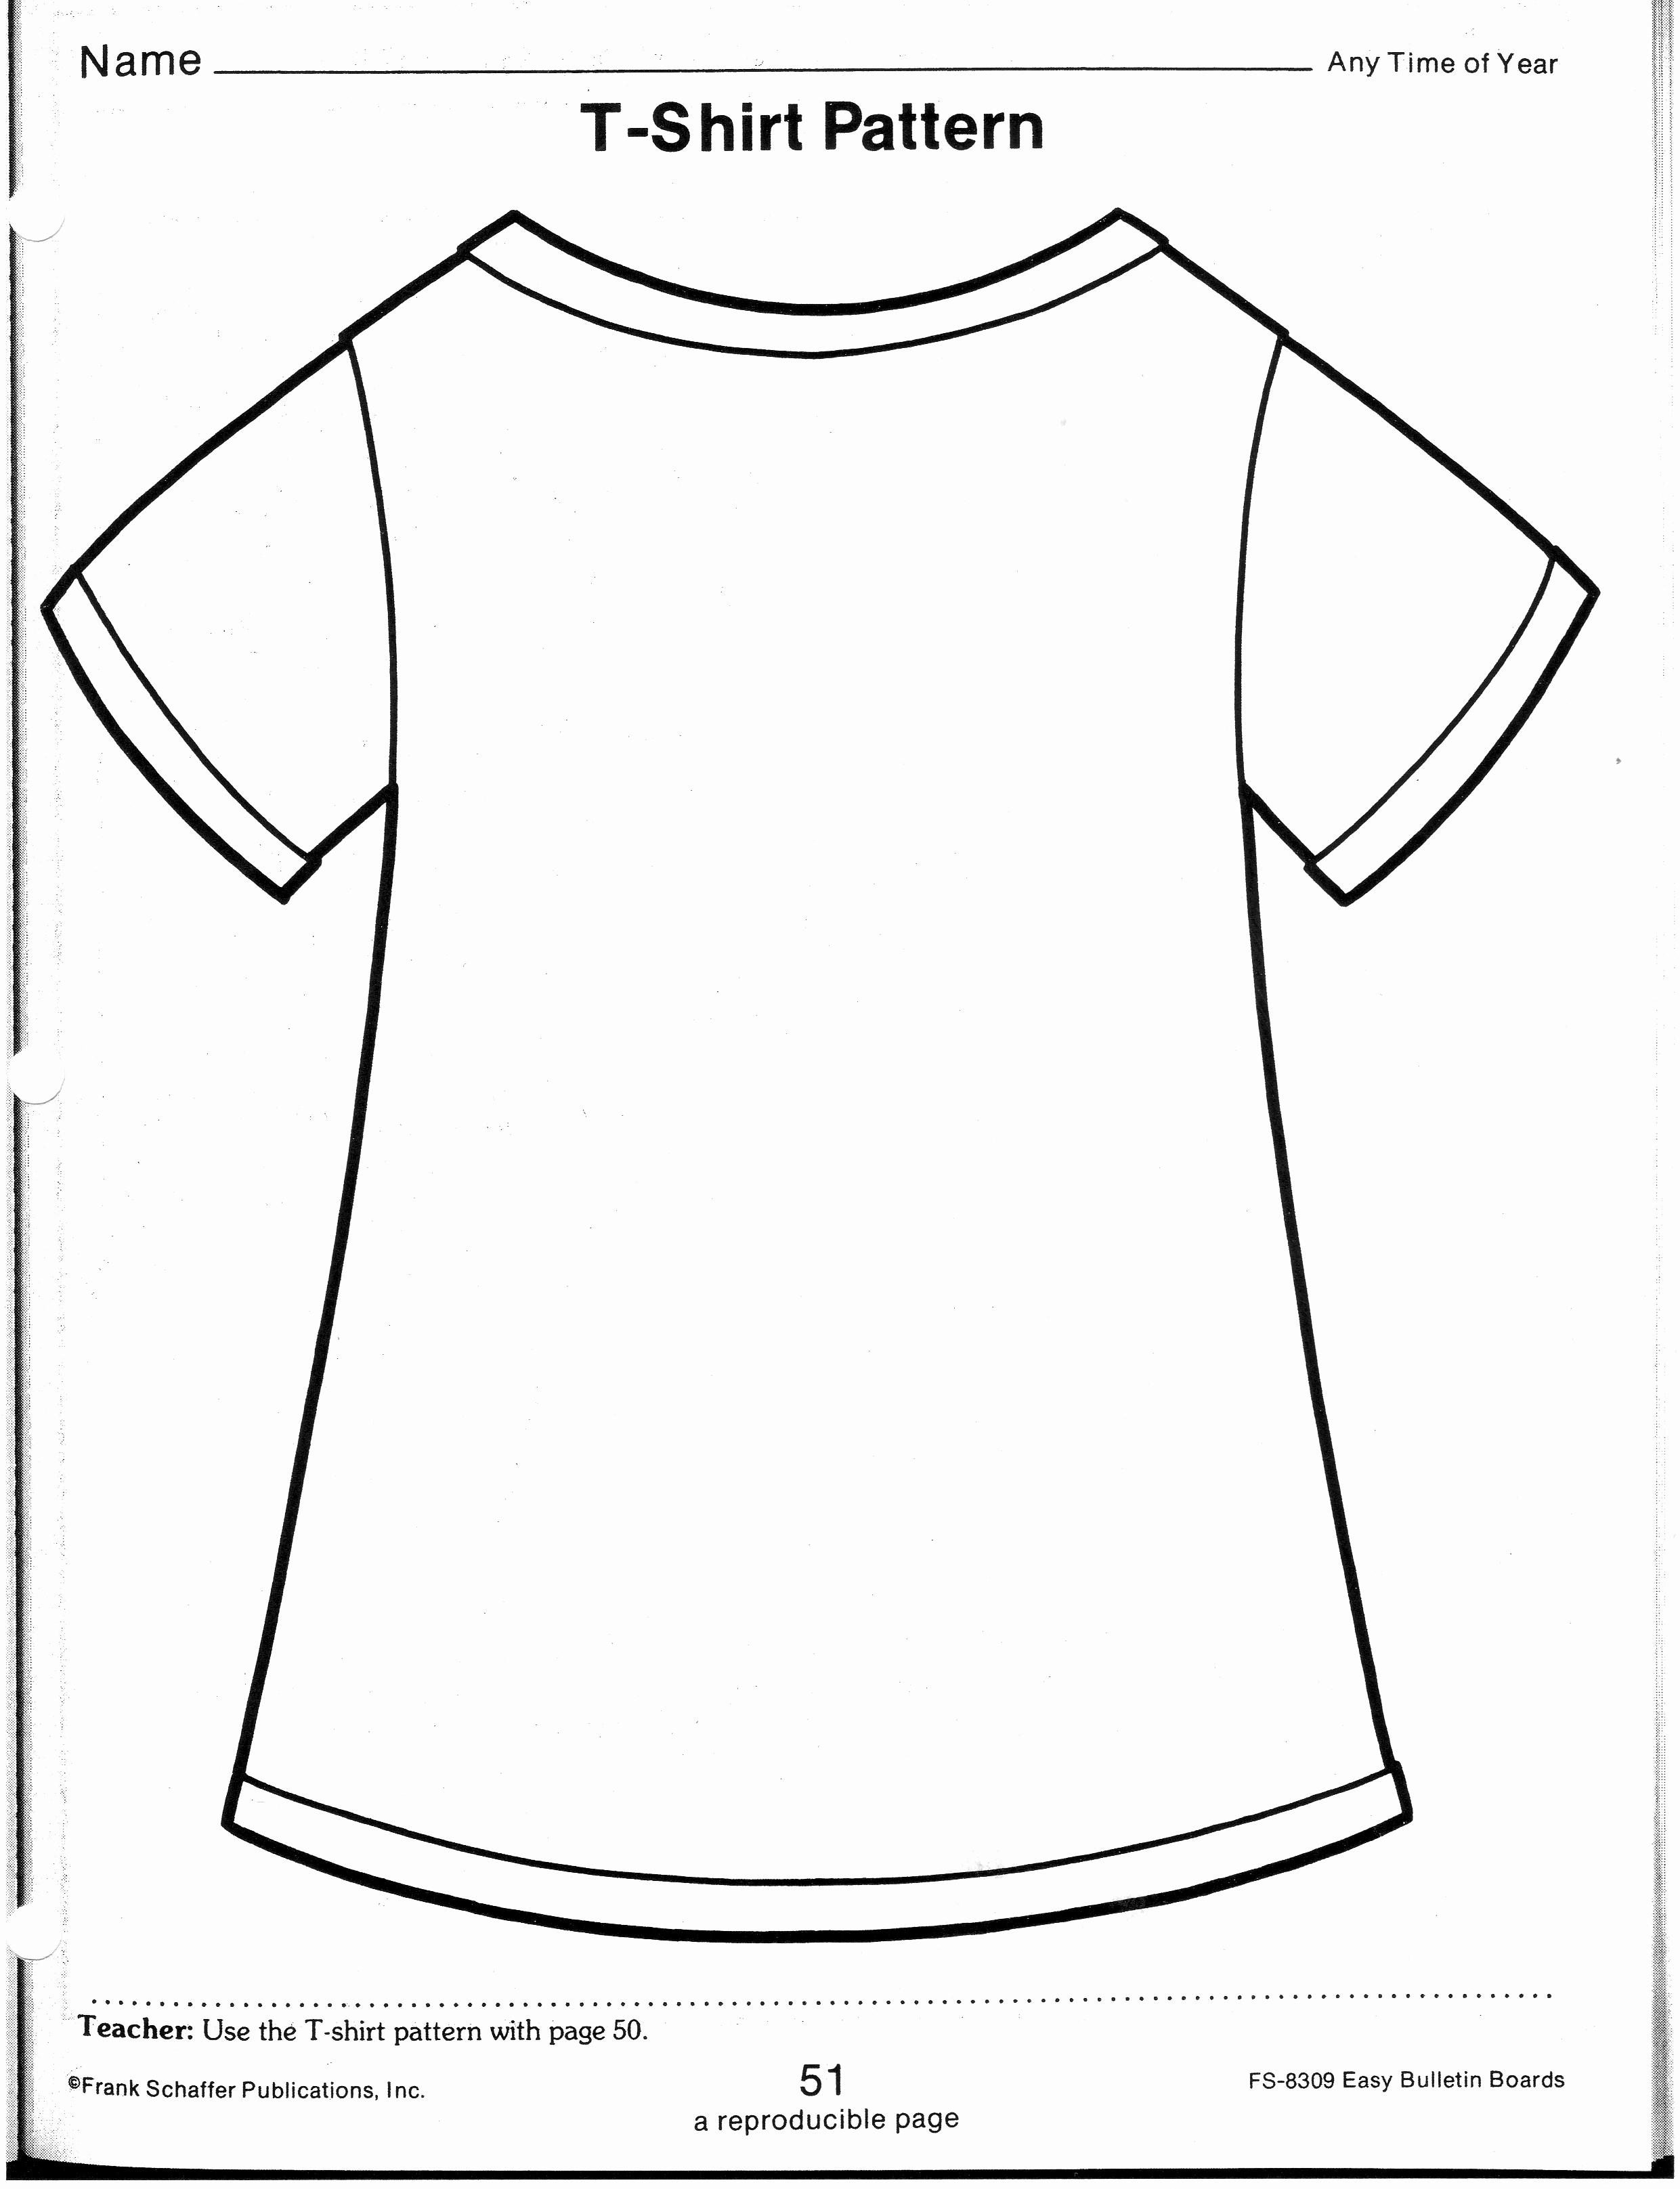 Printable T Shirt Templates Inspirational Printable Tshirt Template Printable 360 Degree